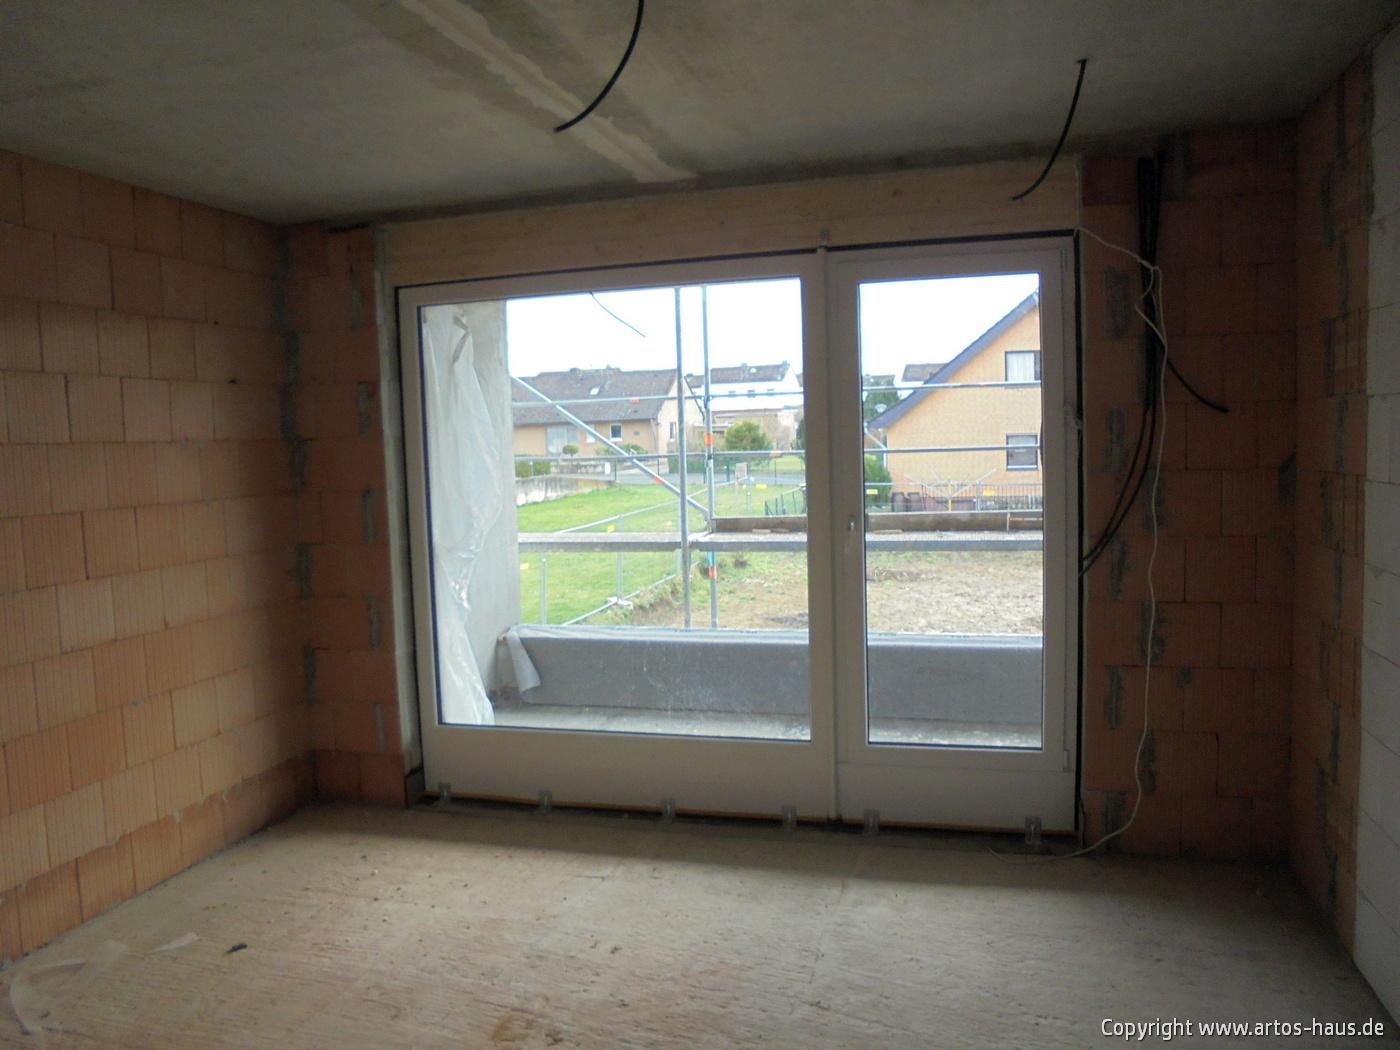 Fenstereinbau | ARTOS-HAUS Bild 5